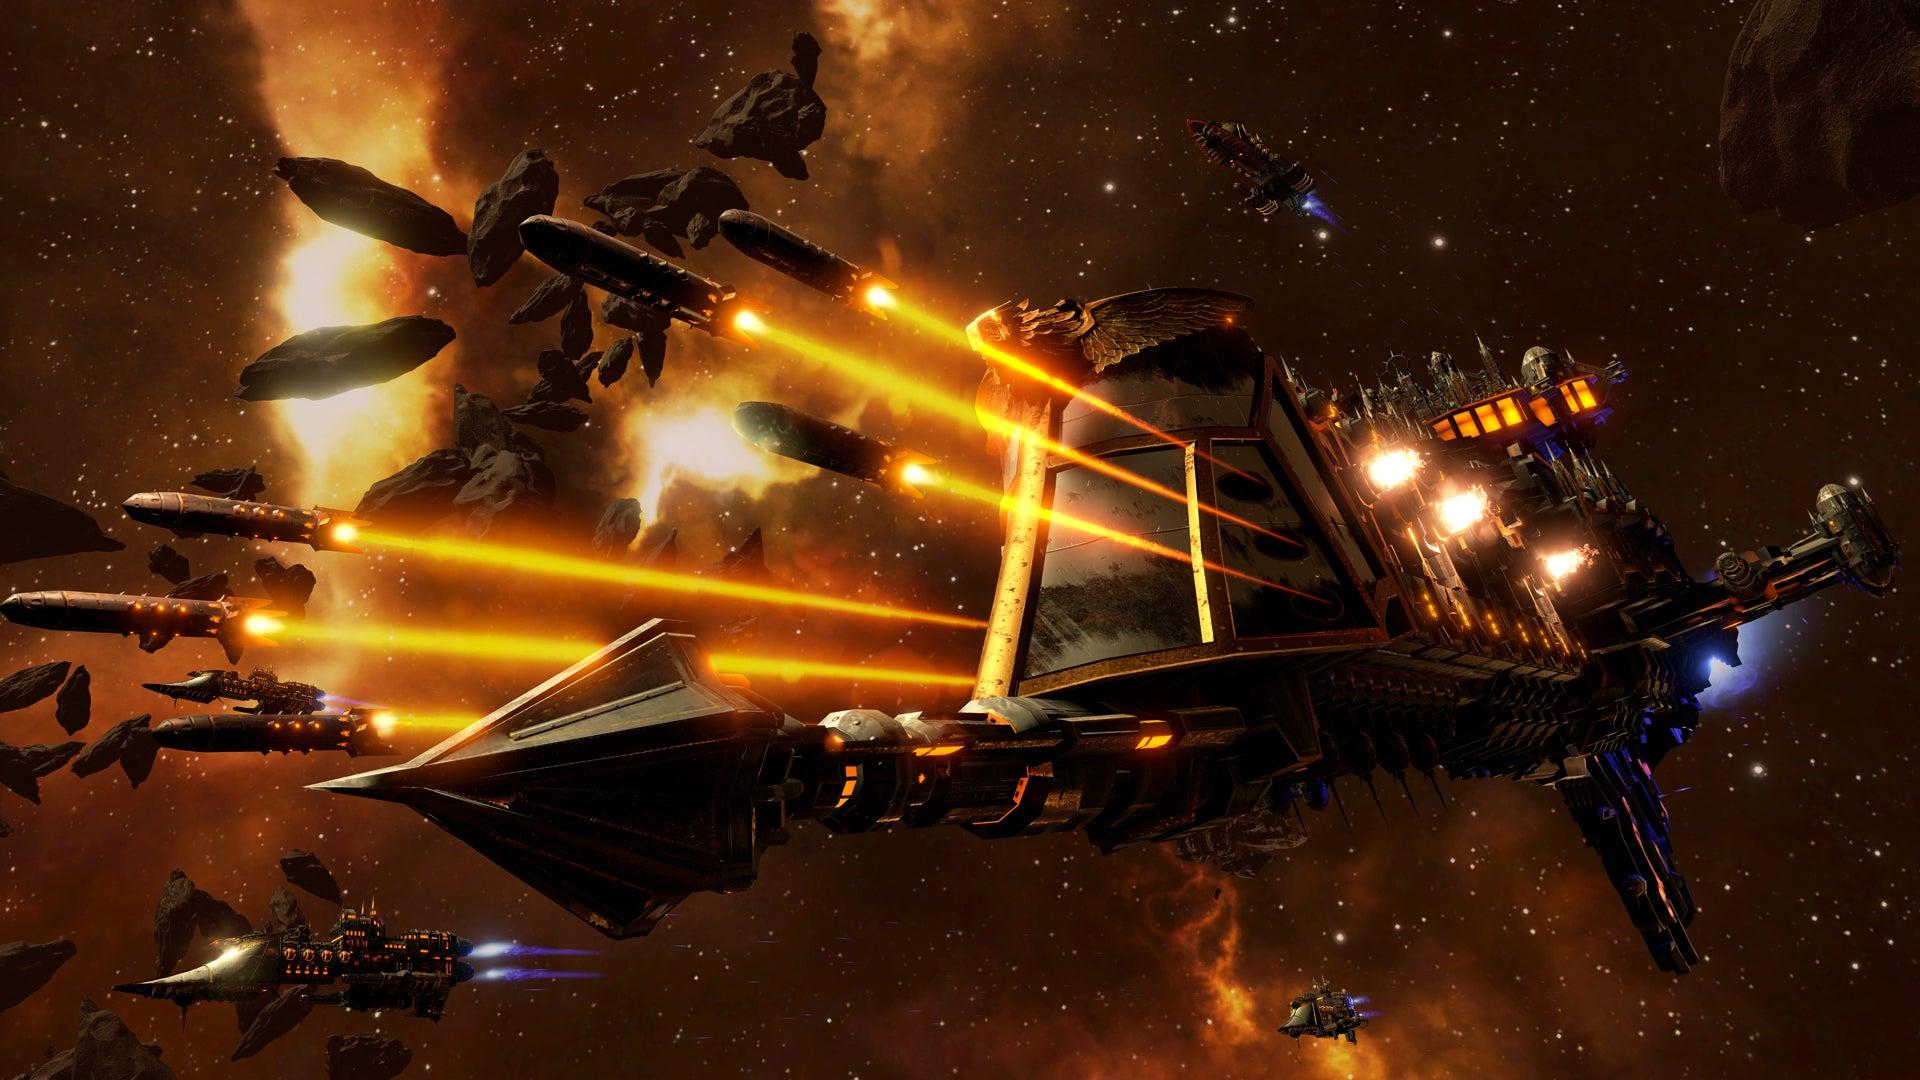 Image for Meet the spaceships of Battlefleet Gothic: Armada